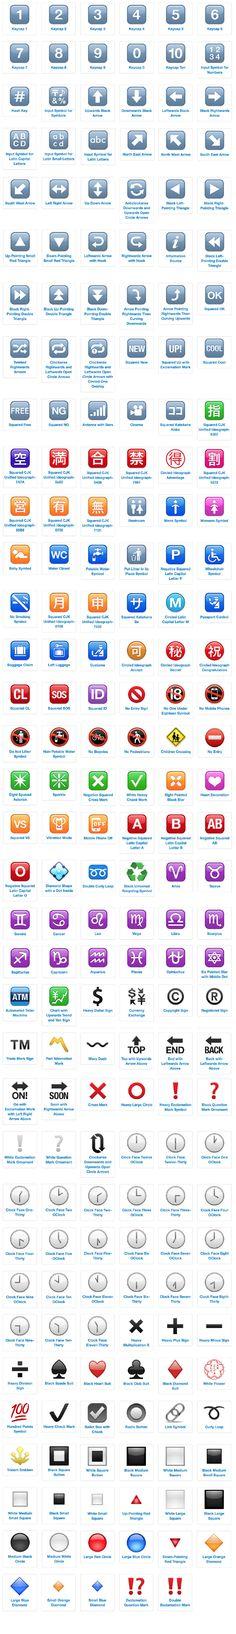 Science Planets Curly Hair On Unicode Agenda Emojis Pinterest